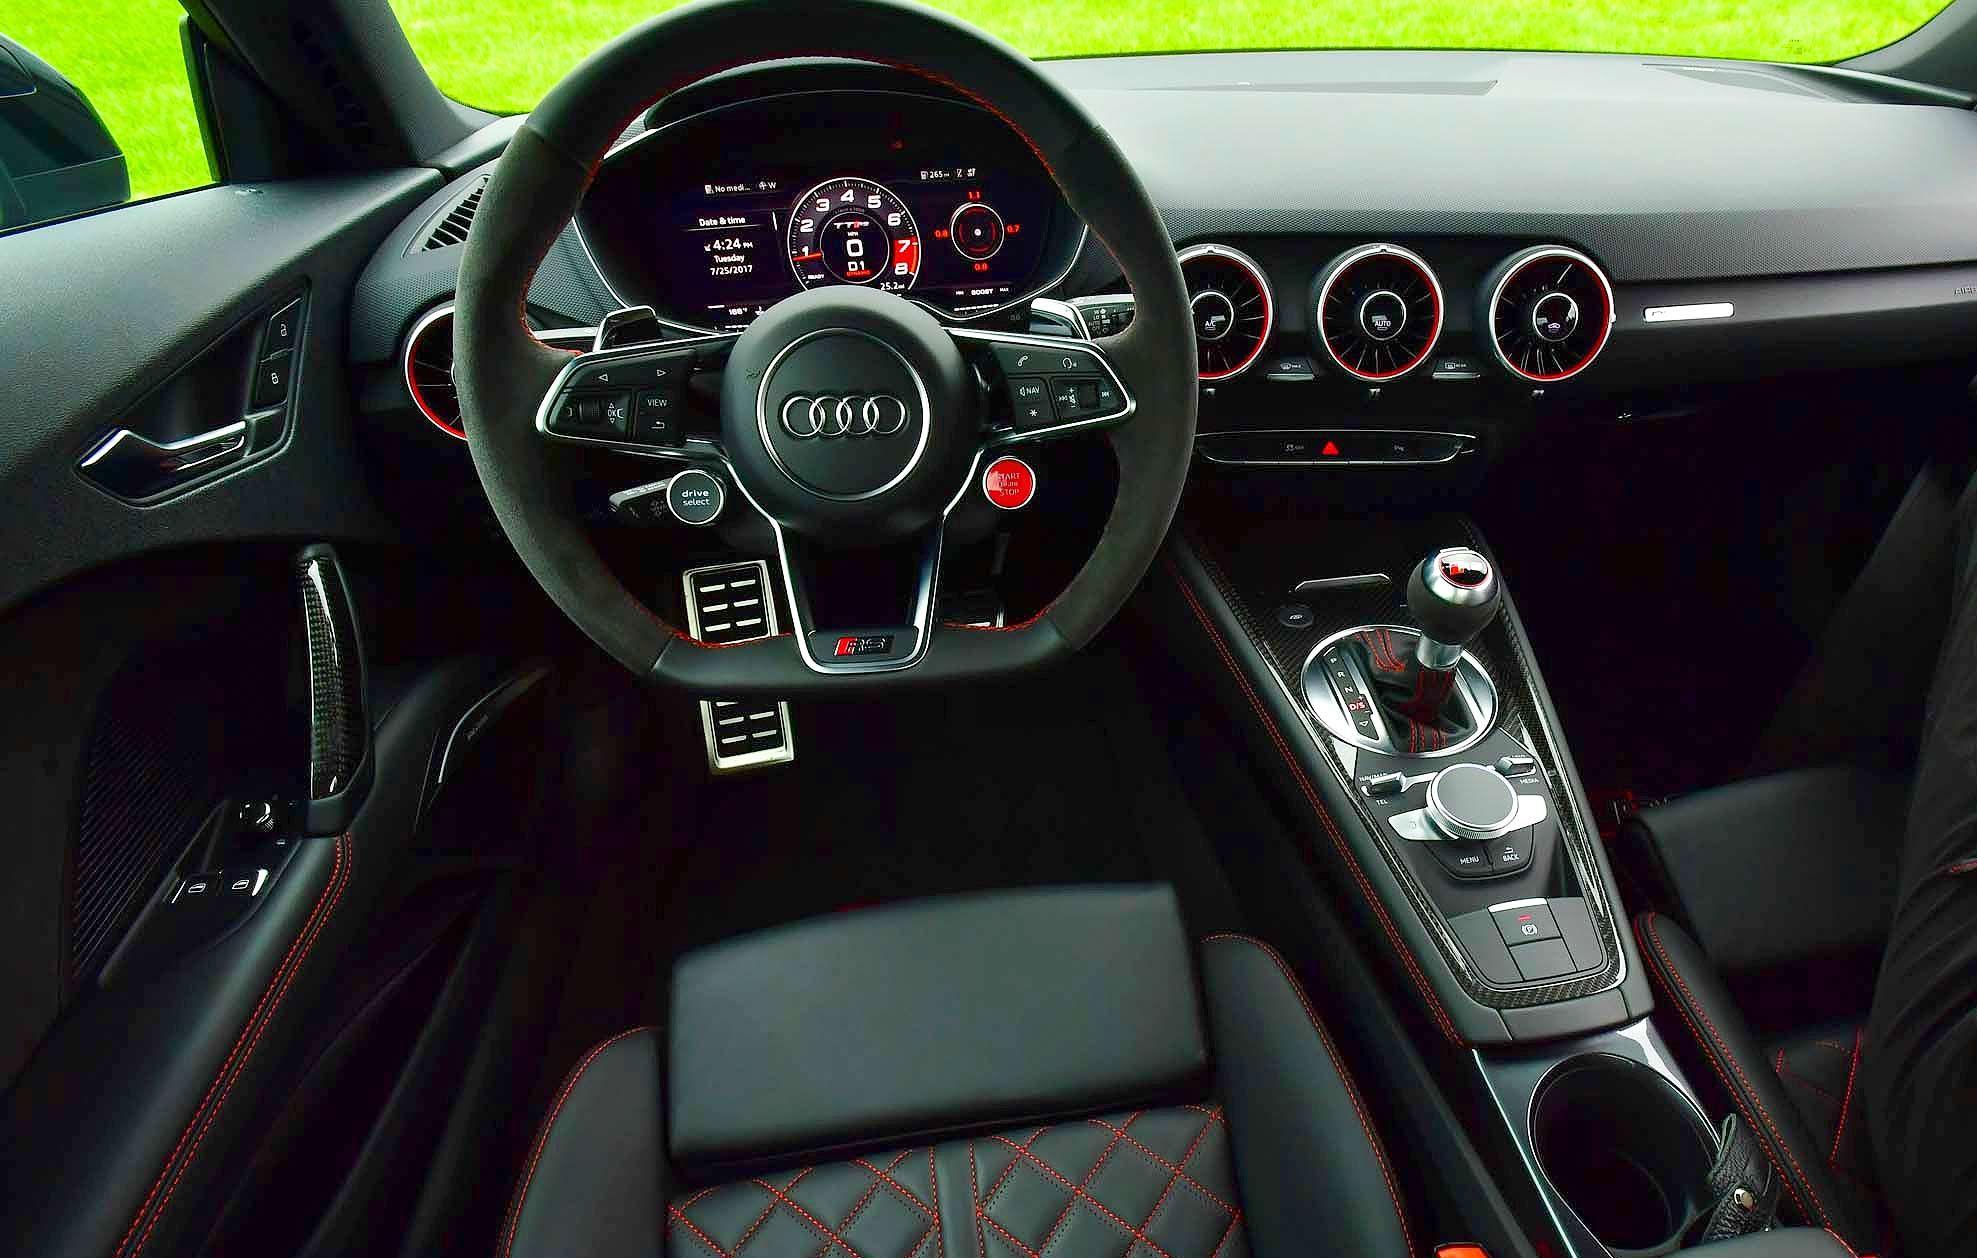 2019 Audi Tt Review Engine Specs And Interior Audi Tt Audi Tt